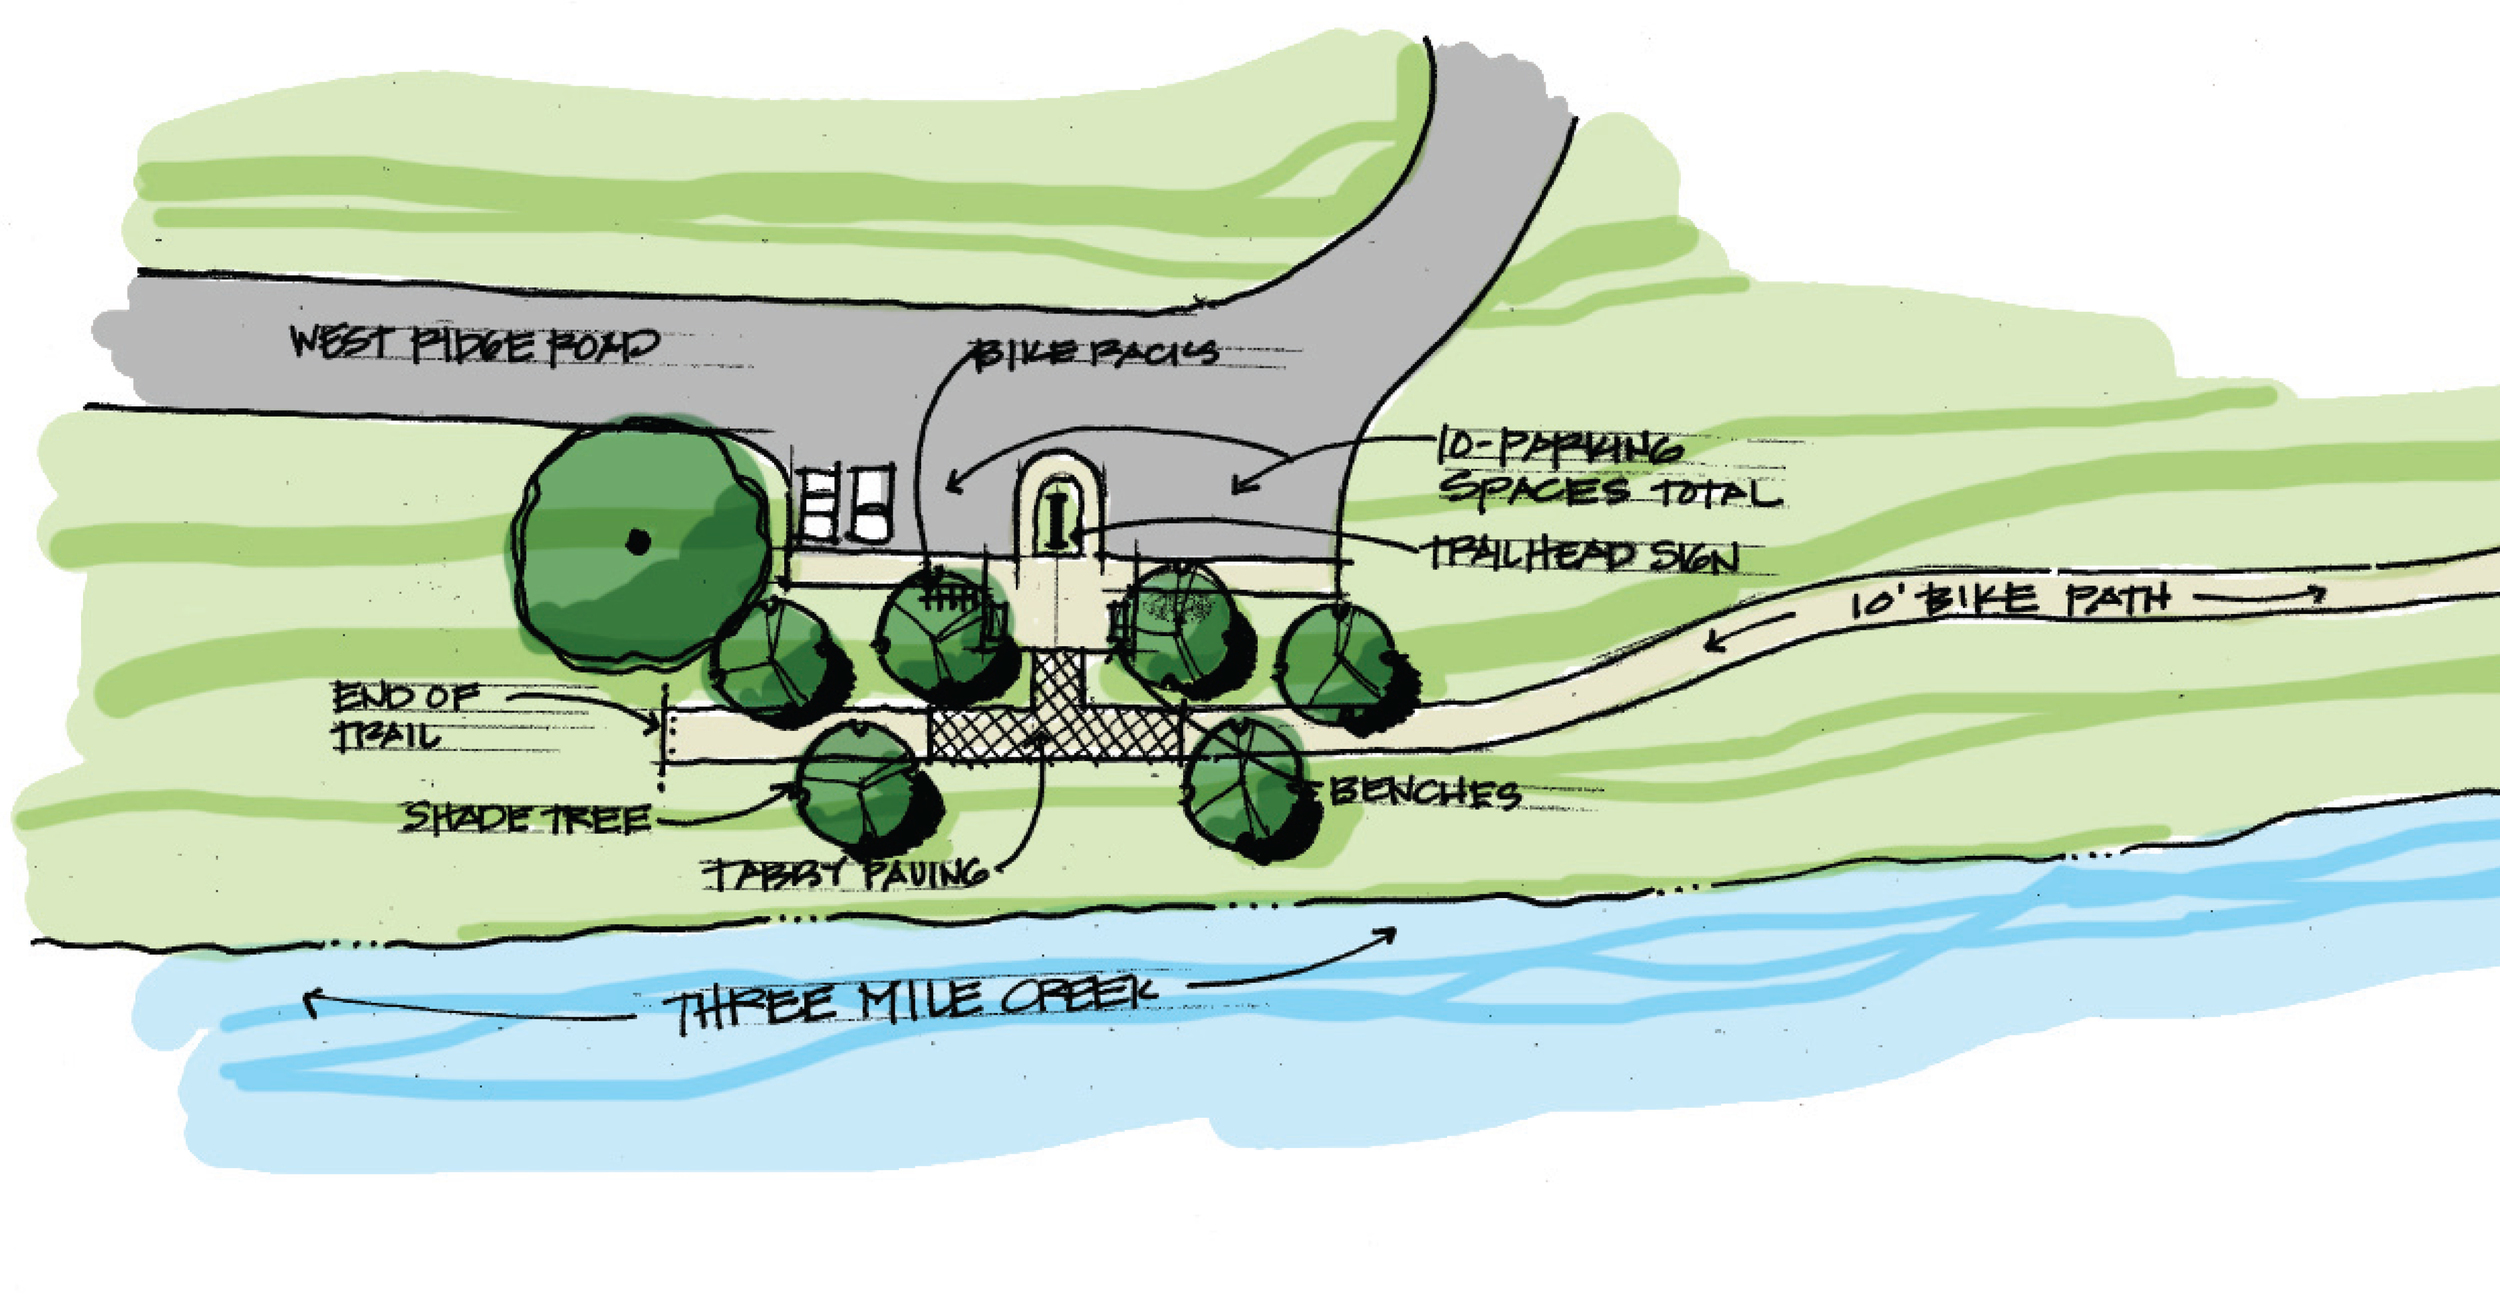 Plan View of West Ridge Road Trailhead